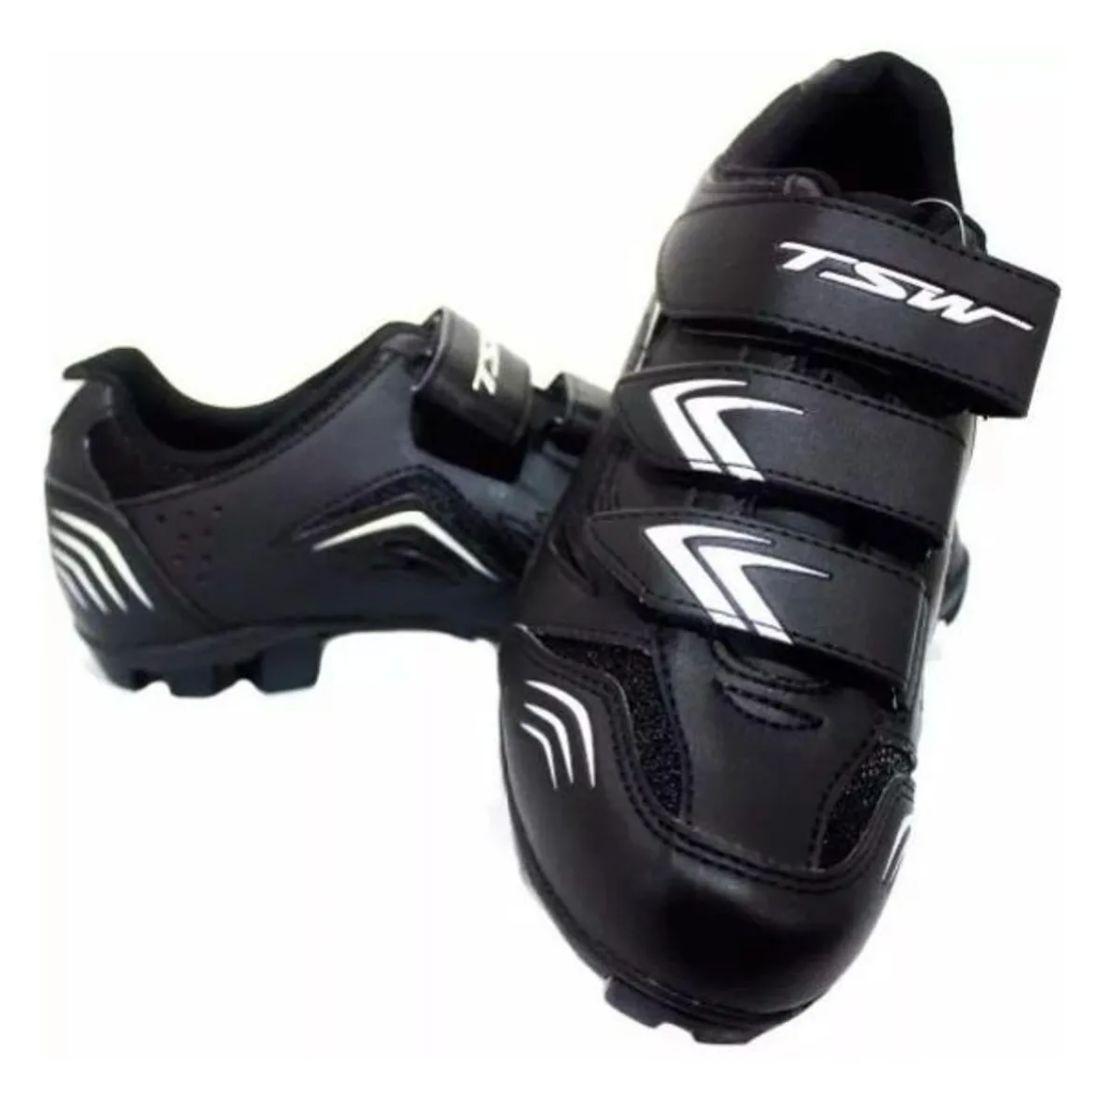 Sapatilha Tsw New Fit P/ Pedal Clip 37-38-39-40-41-42-43-44